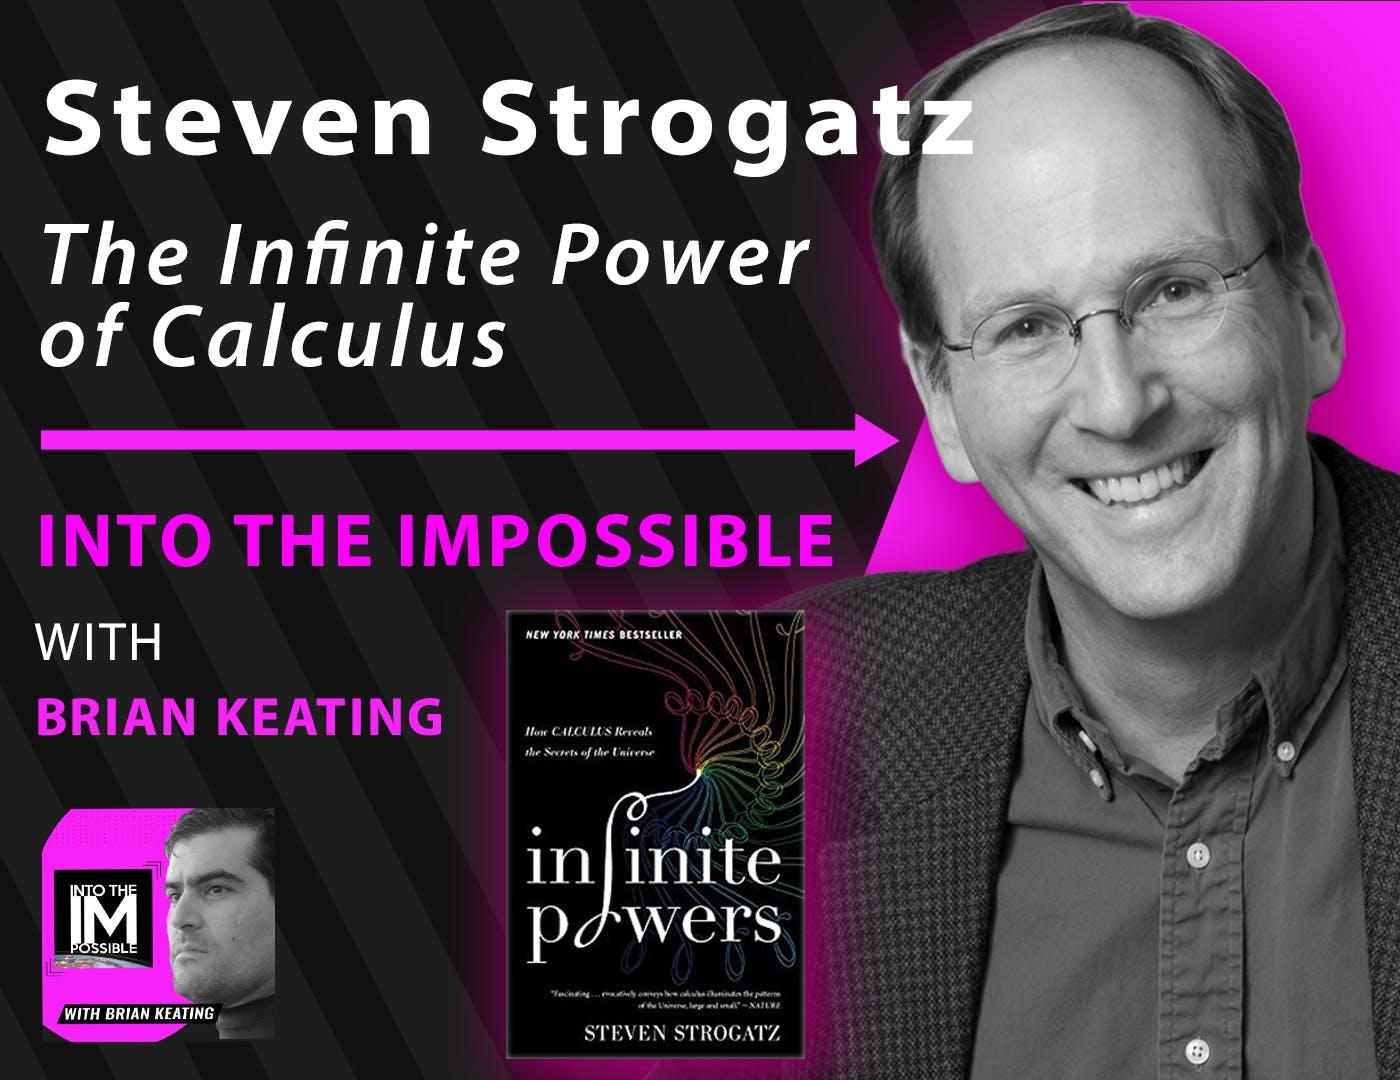 Steven Strogatz: The Infinite Power of Calculus